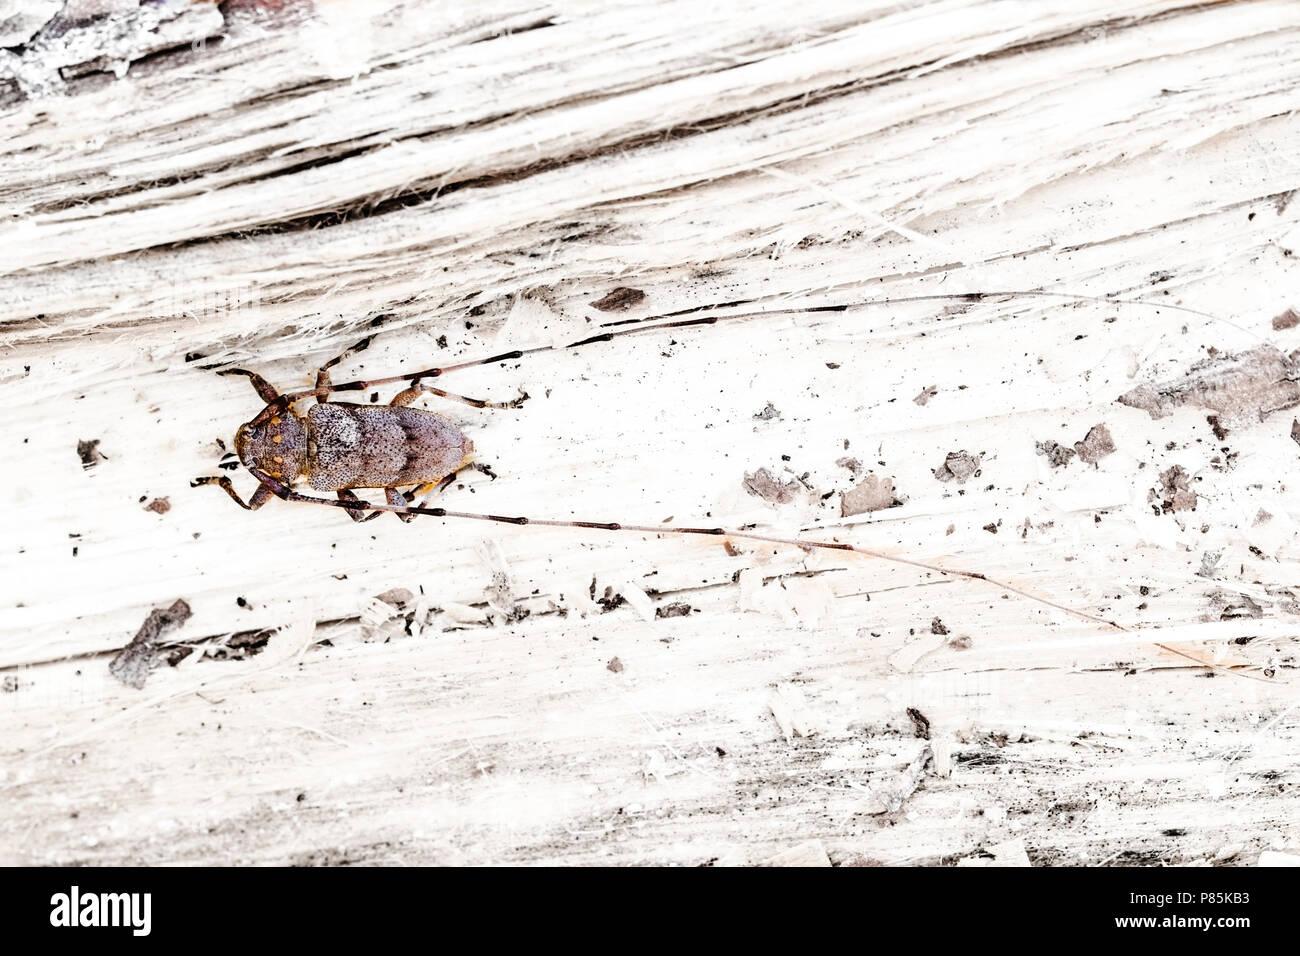 Timberman beetle, Timmerboktor, Acanthocinus aedilis - Stock Image